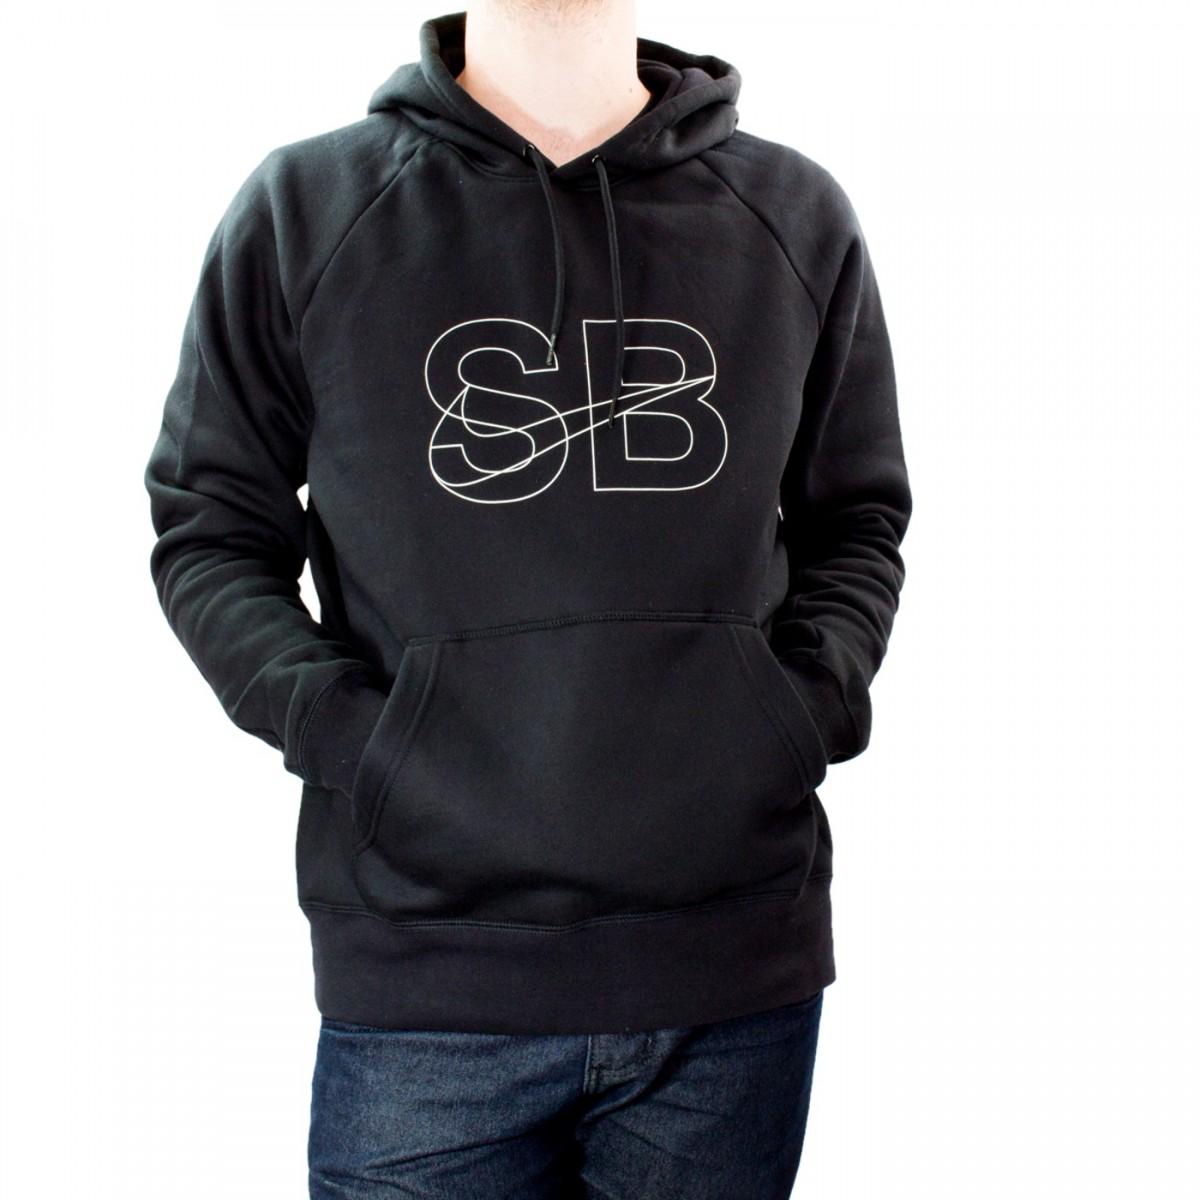 d8ed43bf5a 63311a1c080 Bizz Store - Moletom Masculino Nike Icon Hoodie Stencil Com  Capuz ...